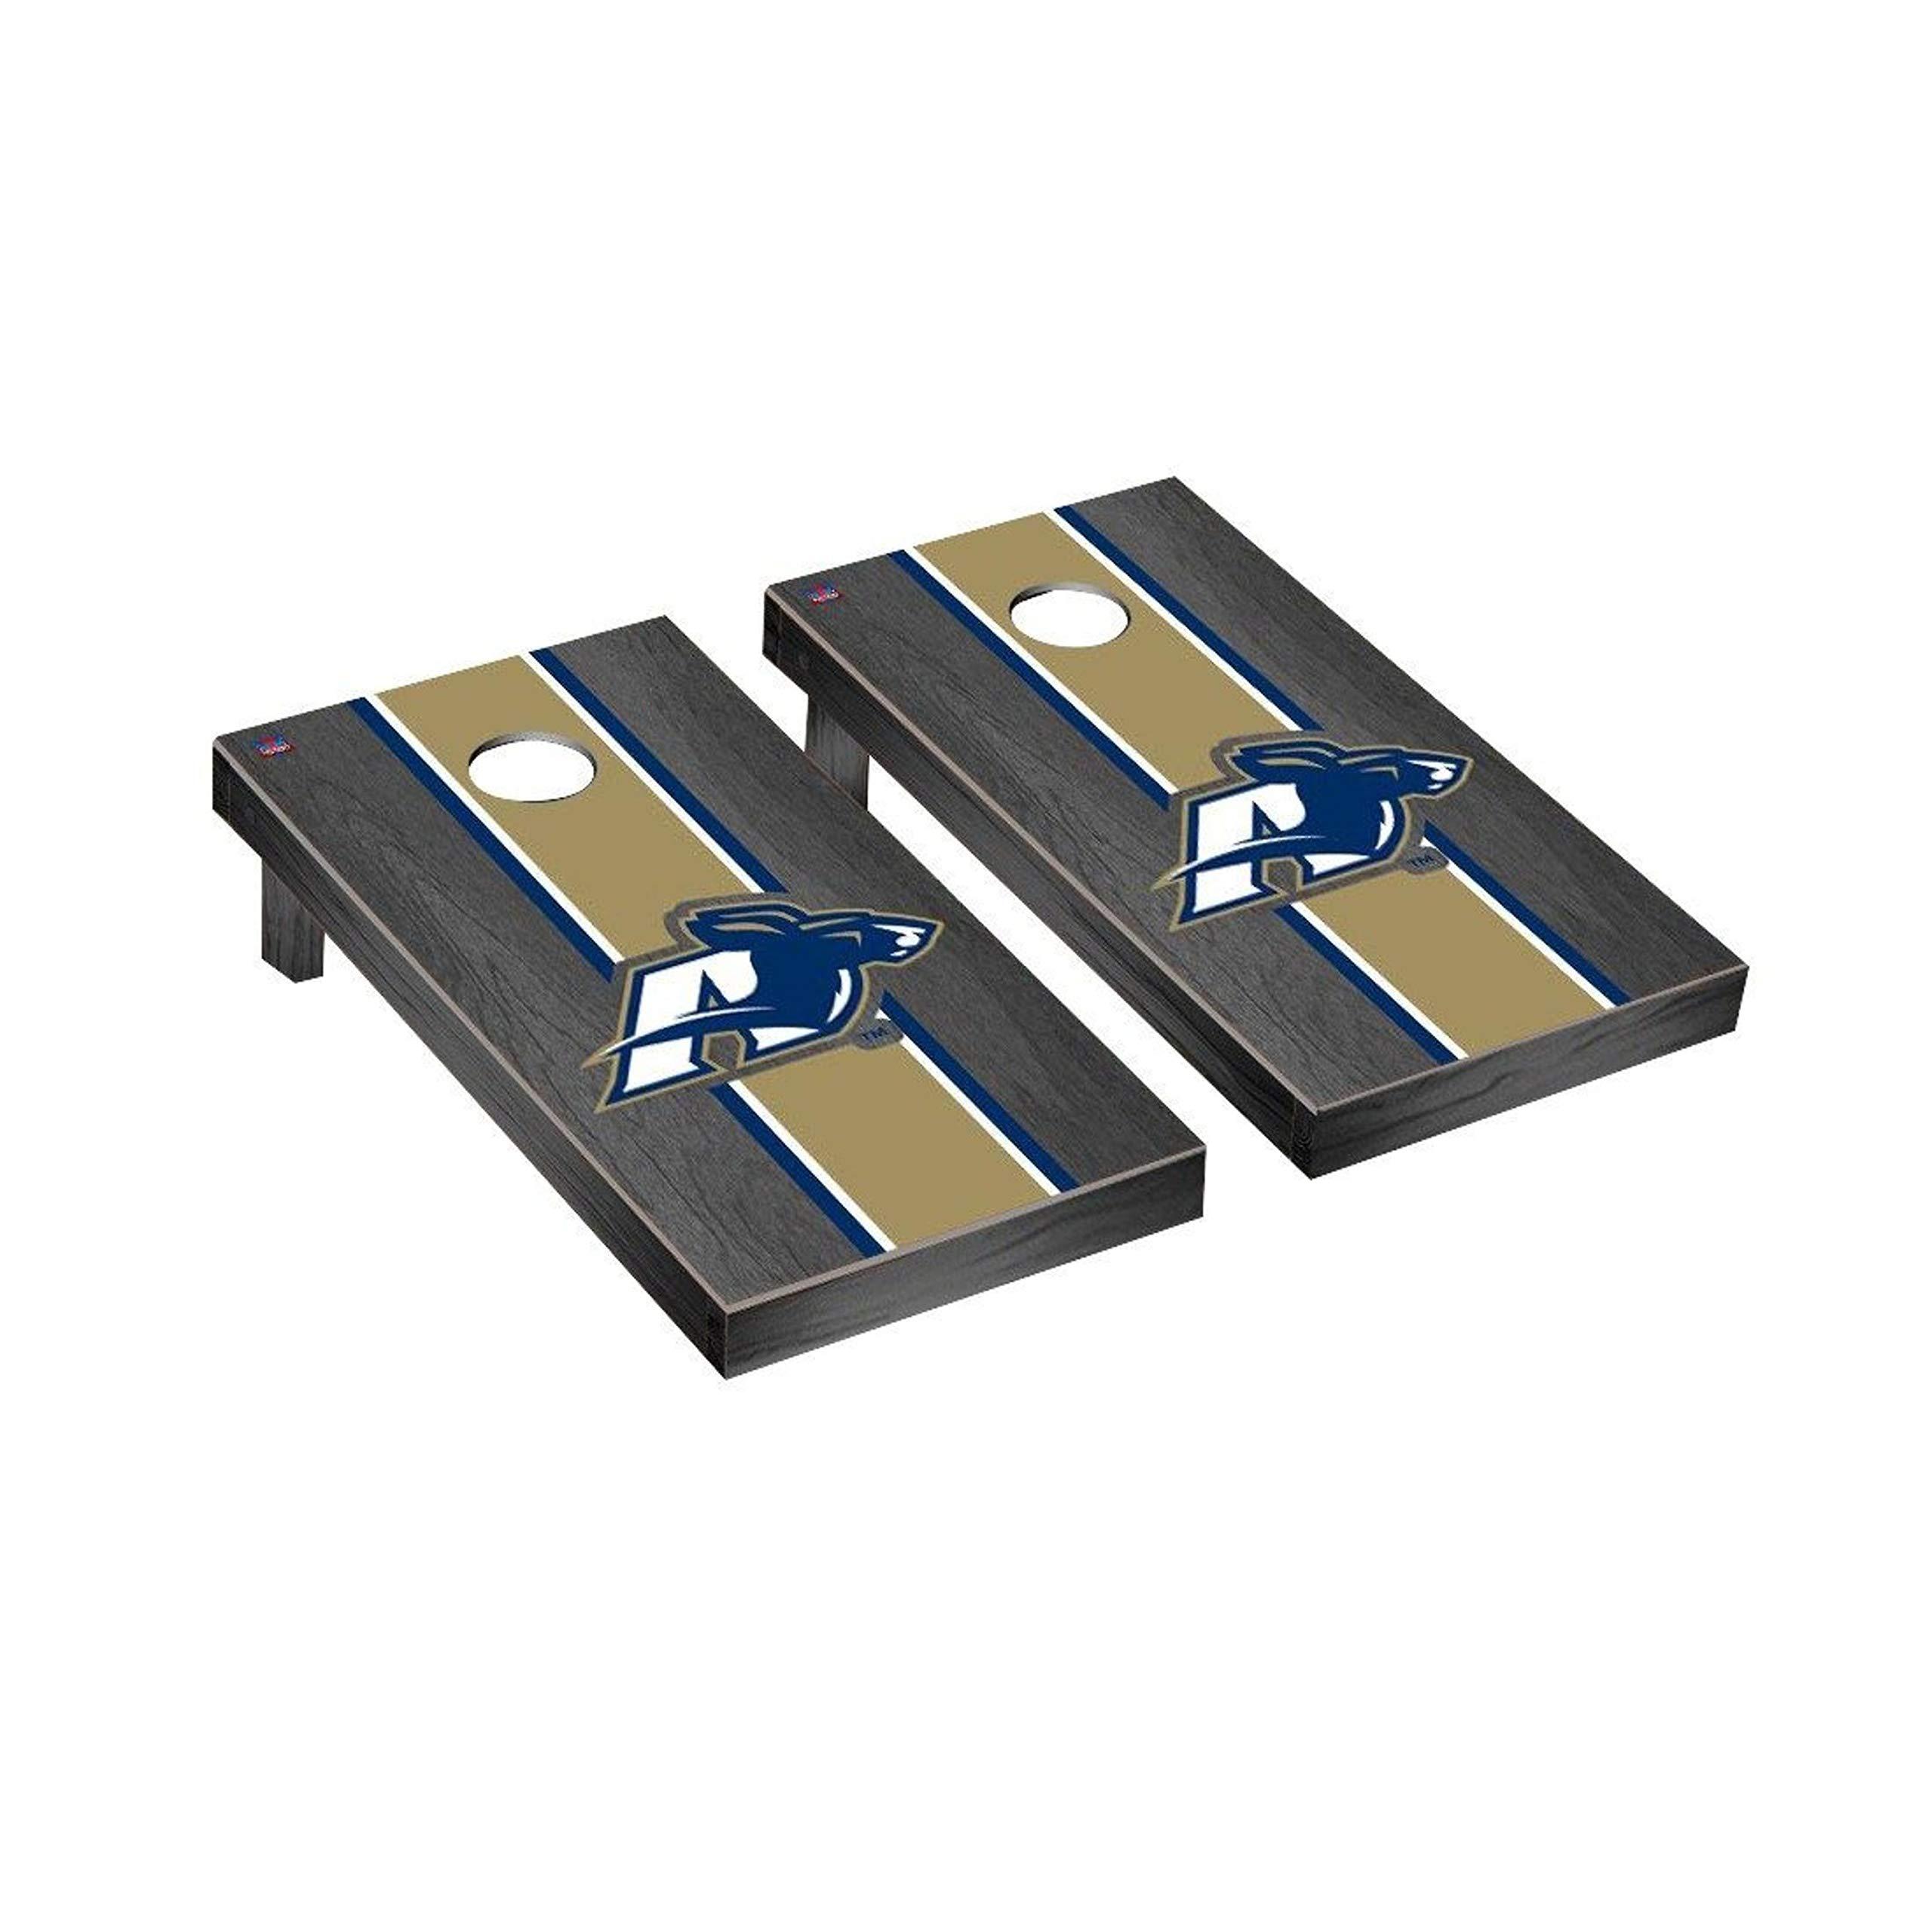 Victory Tailgate Regulation Collegiate NCAA Onyx Stained Stripe Series Cornhole Board Set - 2 Boards, 8 Bags - Akron Zips